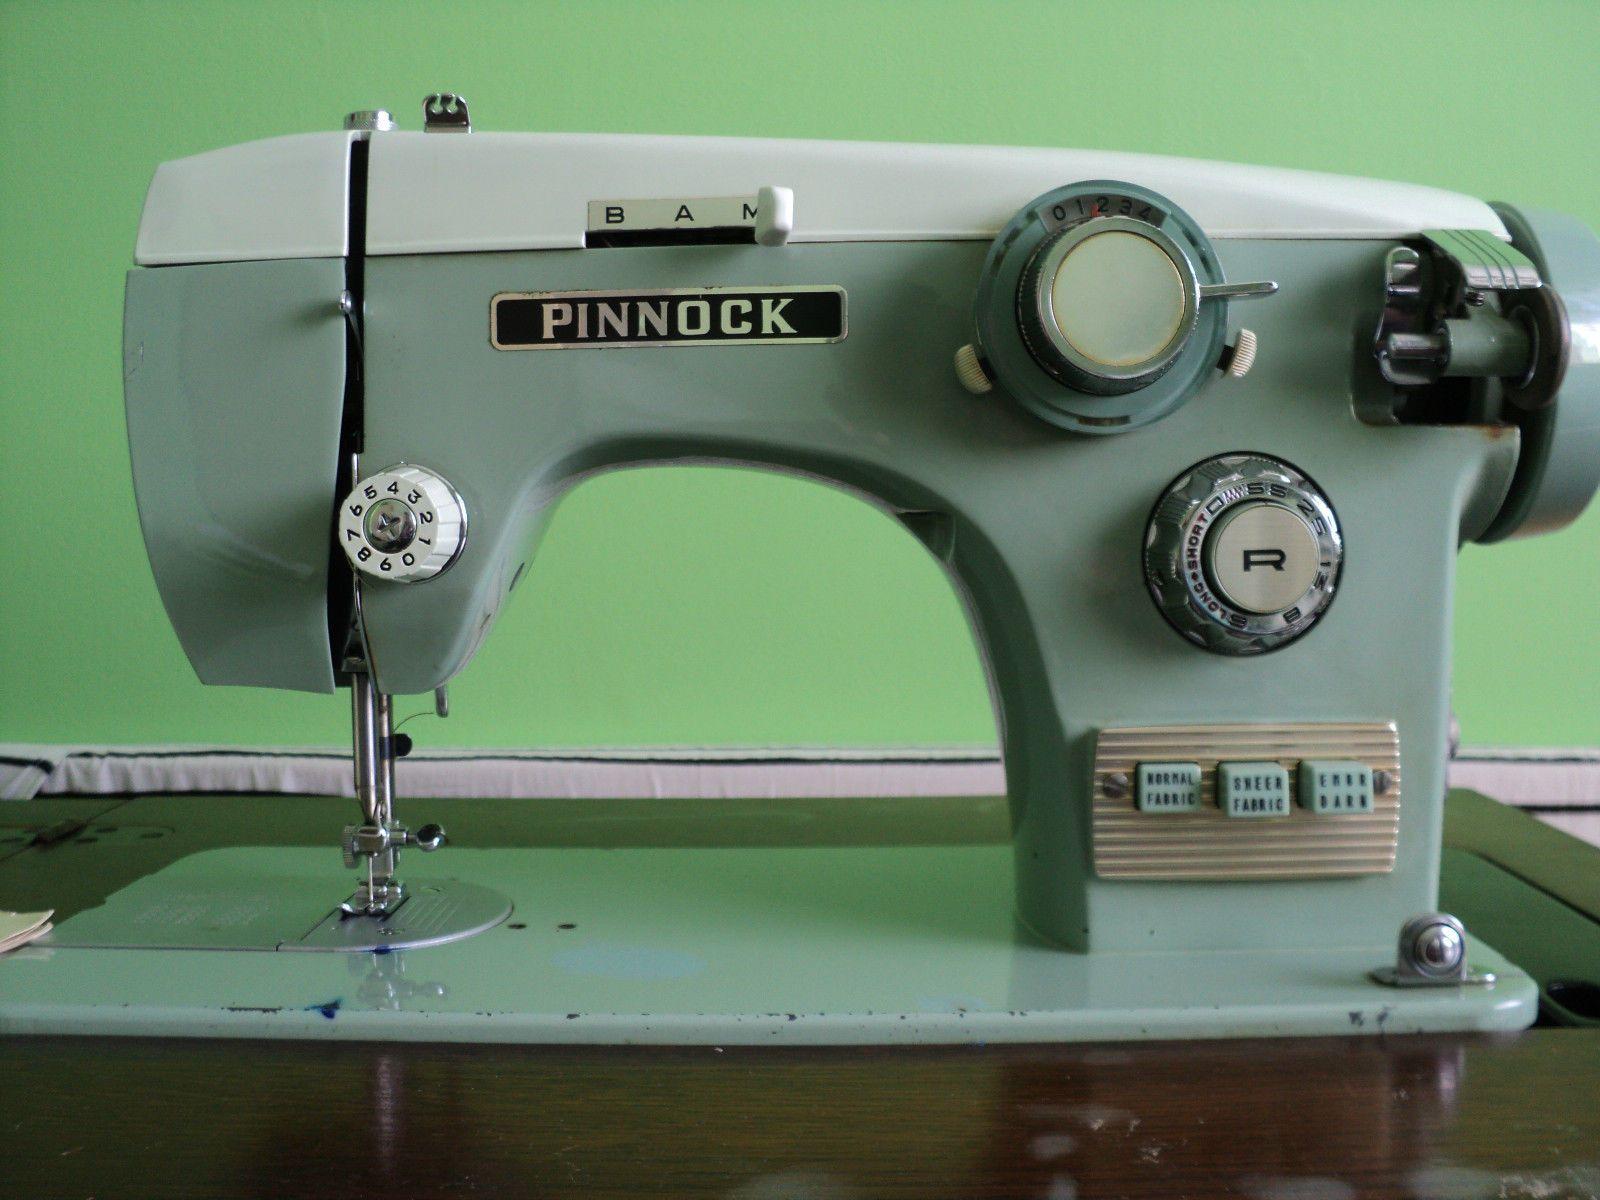 Pinnock Sewing Machine In Cabinet Ebay Sewing Machines